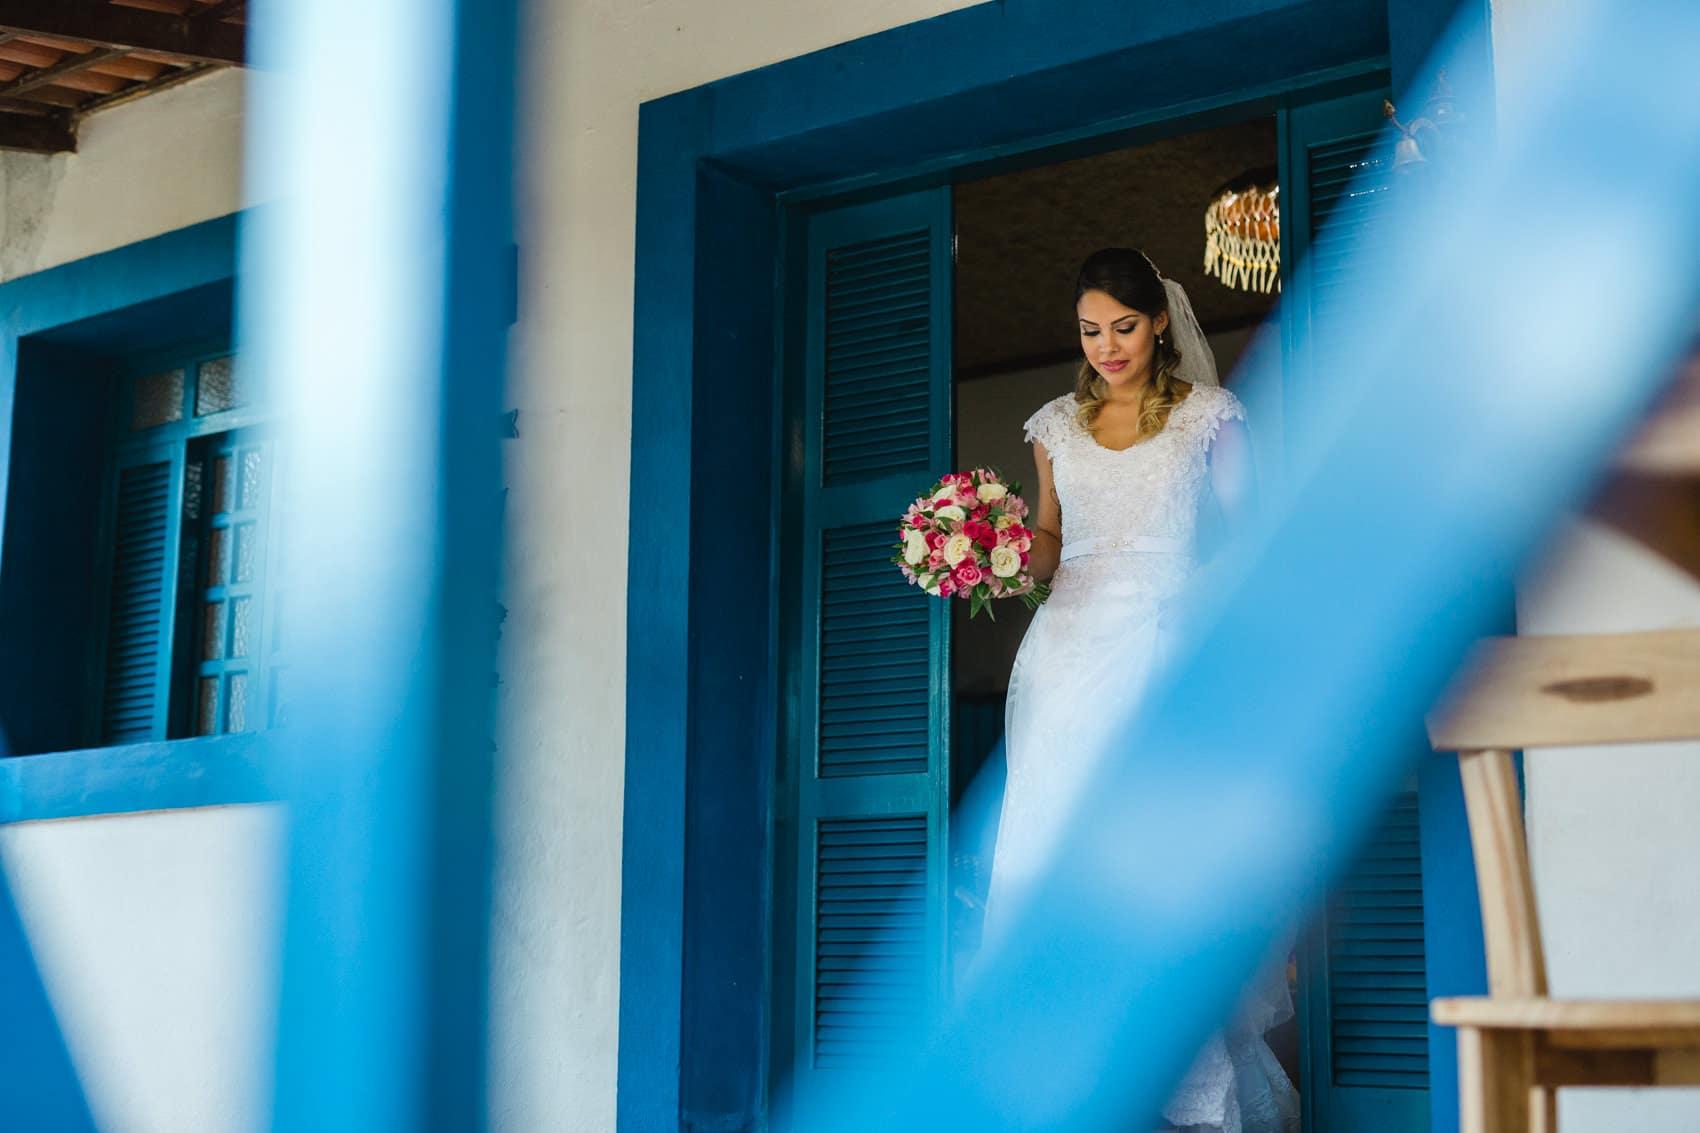 casamento-sitio-serra-guaramiranga-23